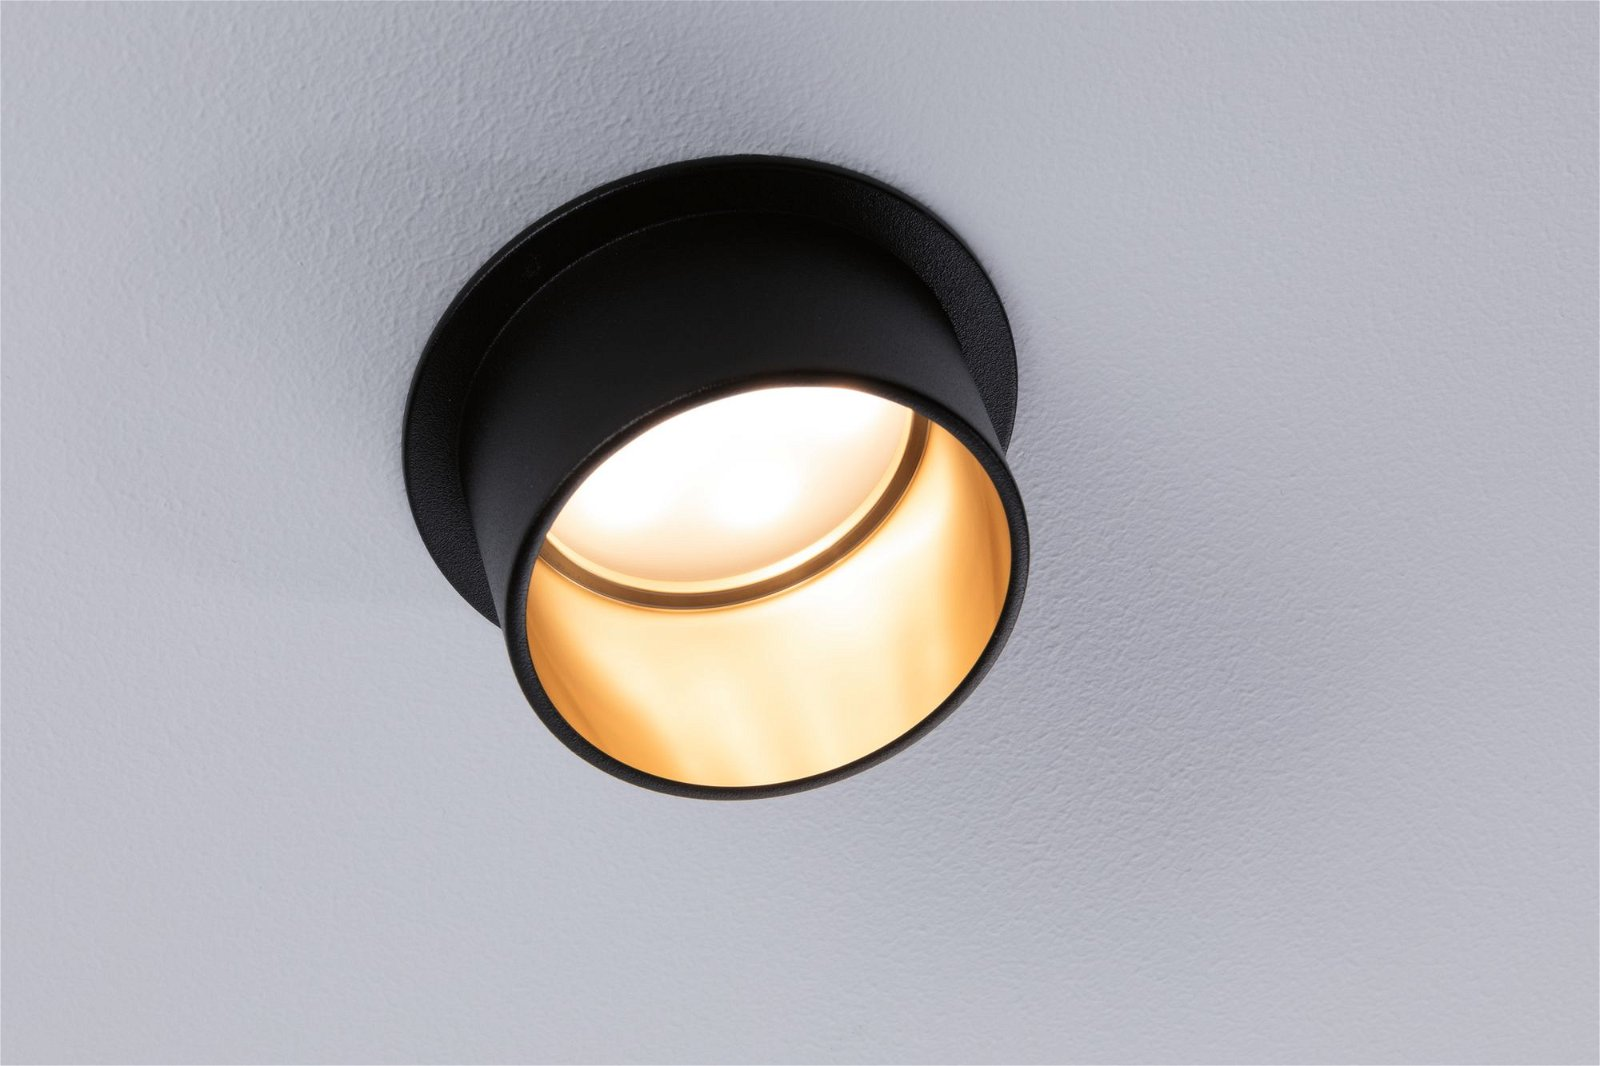 LED Recessed luminaire 3-Step-Dim Gil Coin Basic Set IP44 round 68mm Coin 3x6W 3x470lm 230V 2700K Black matt/Gold